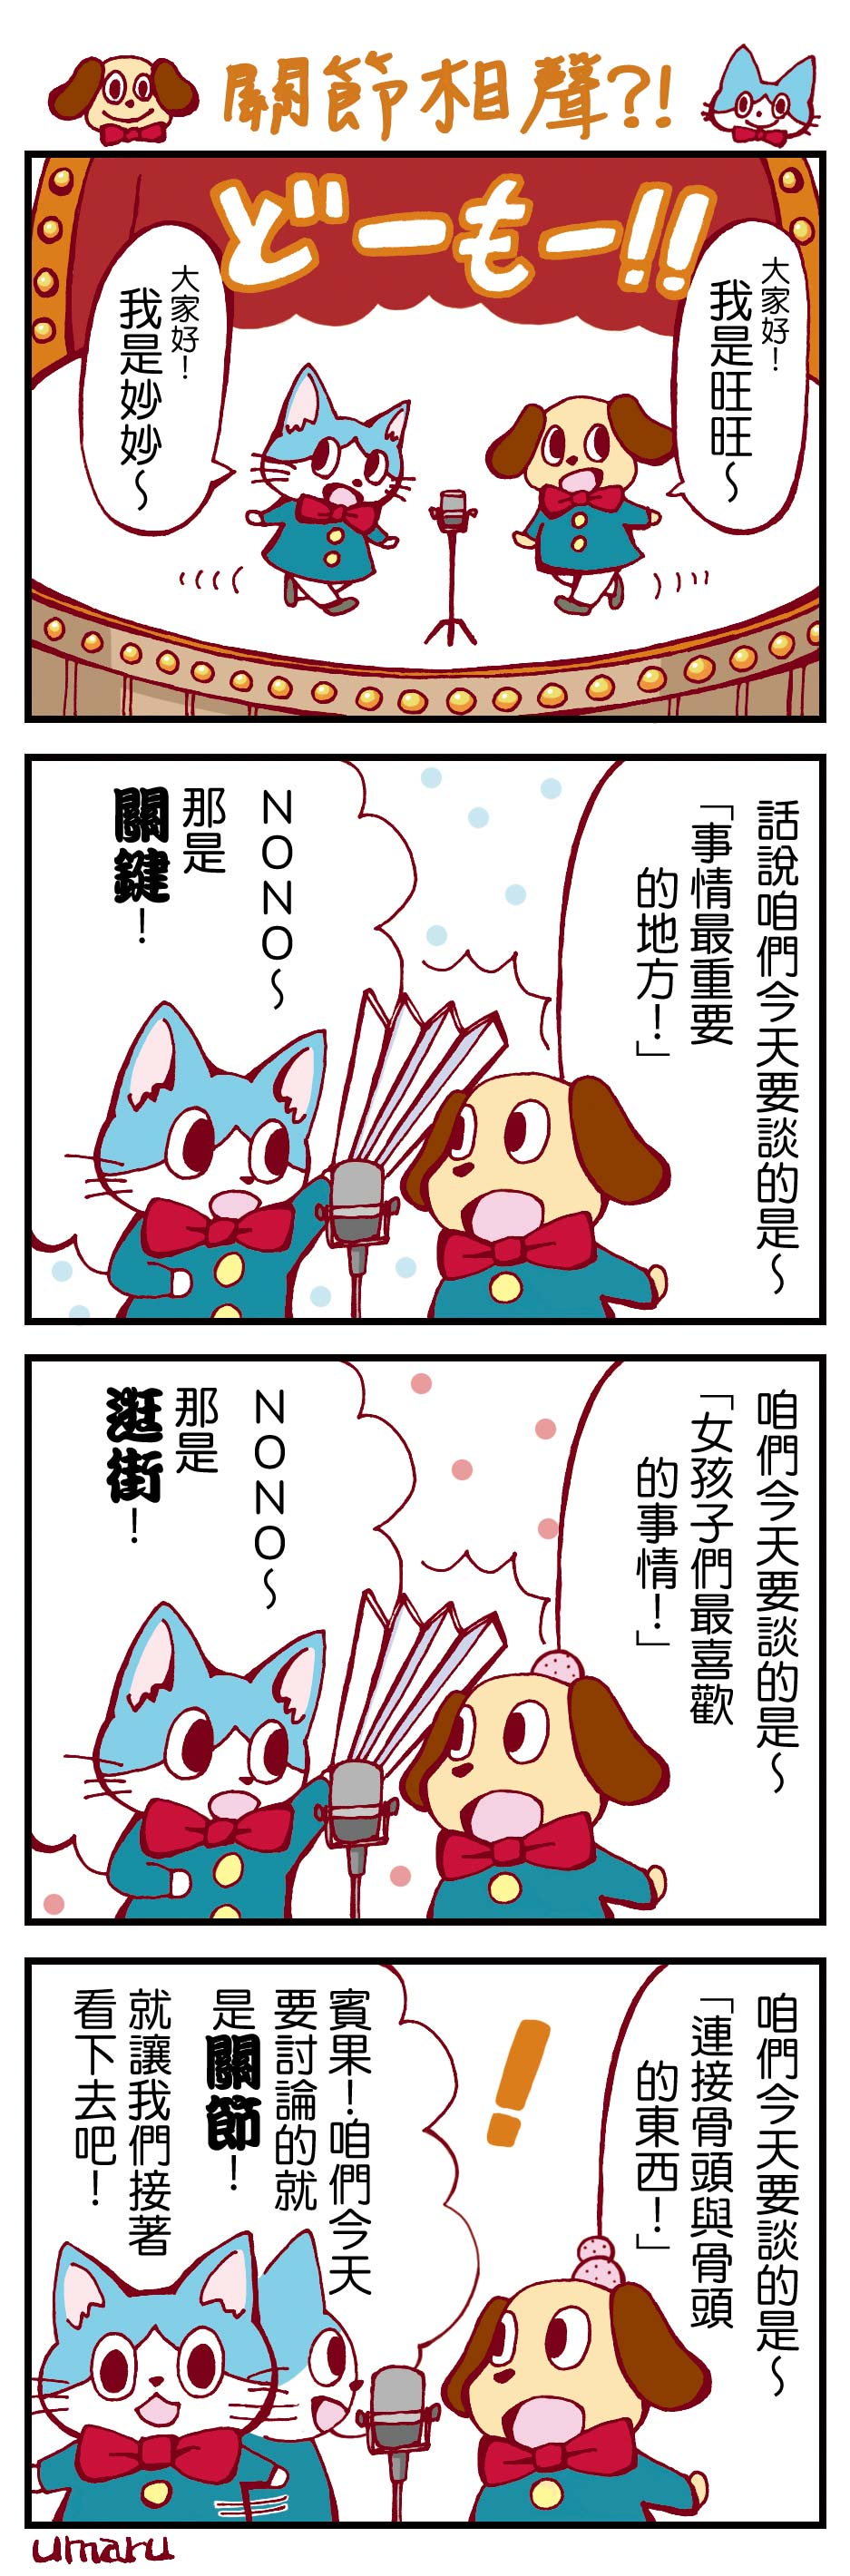 kichikichi_2013_4koma_kansetsu_rgb.jpg